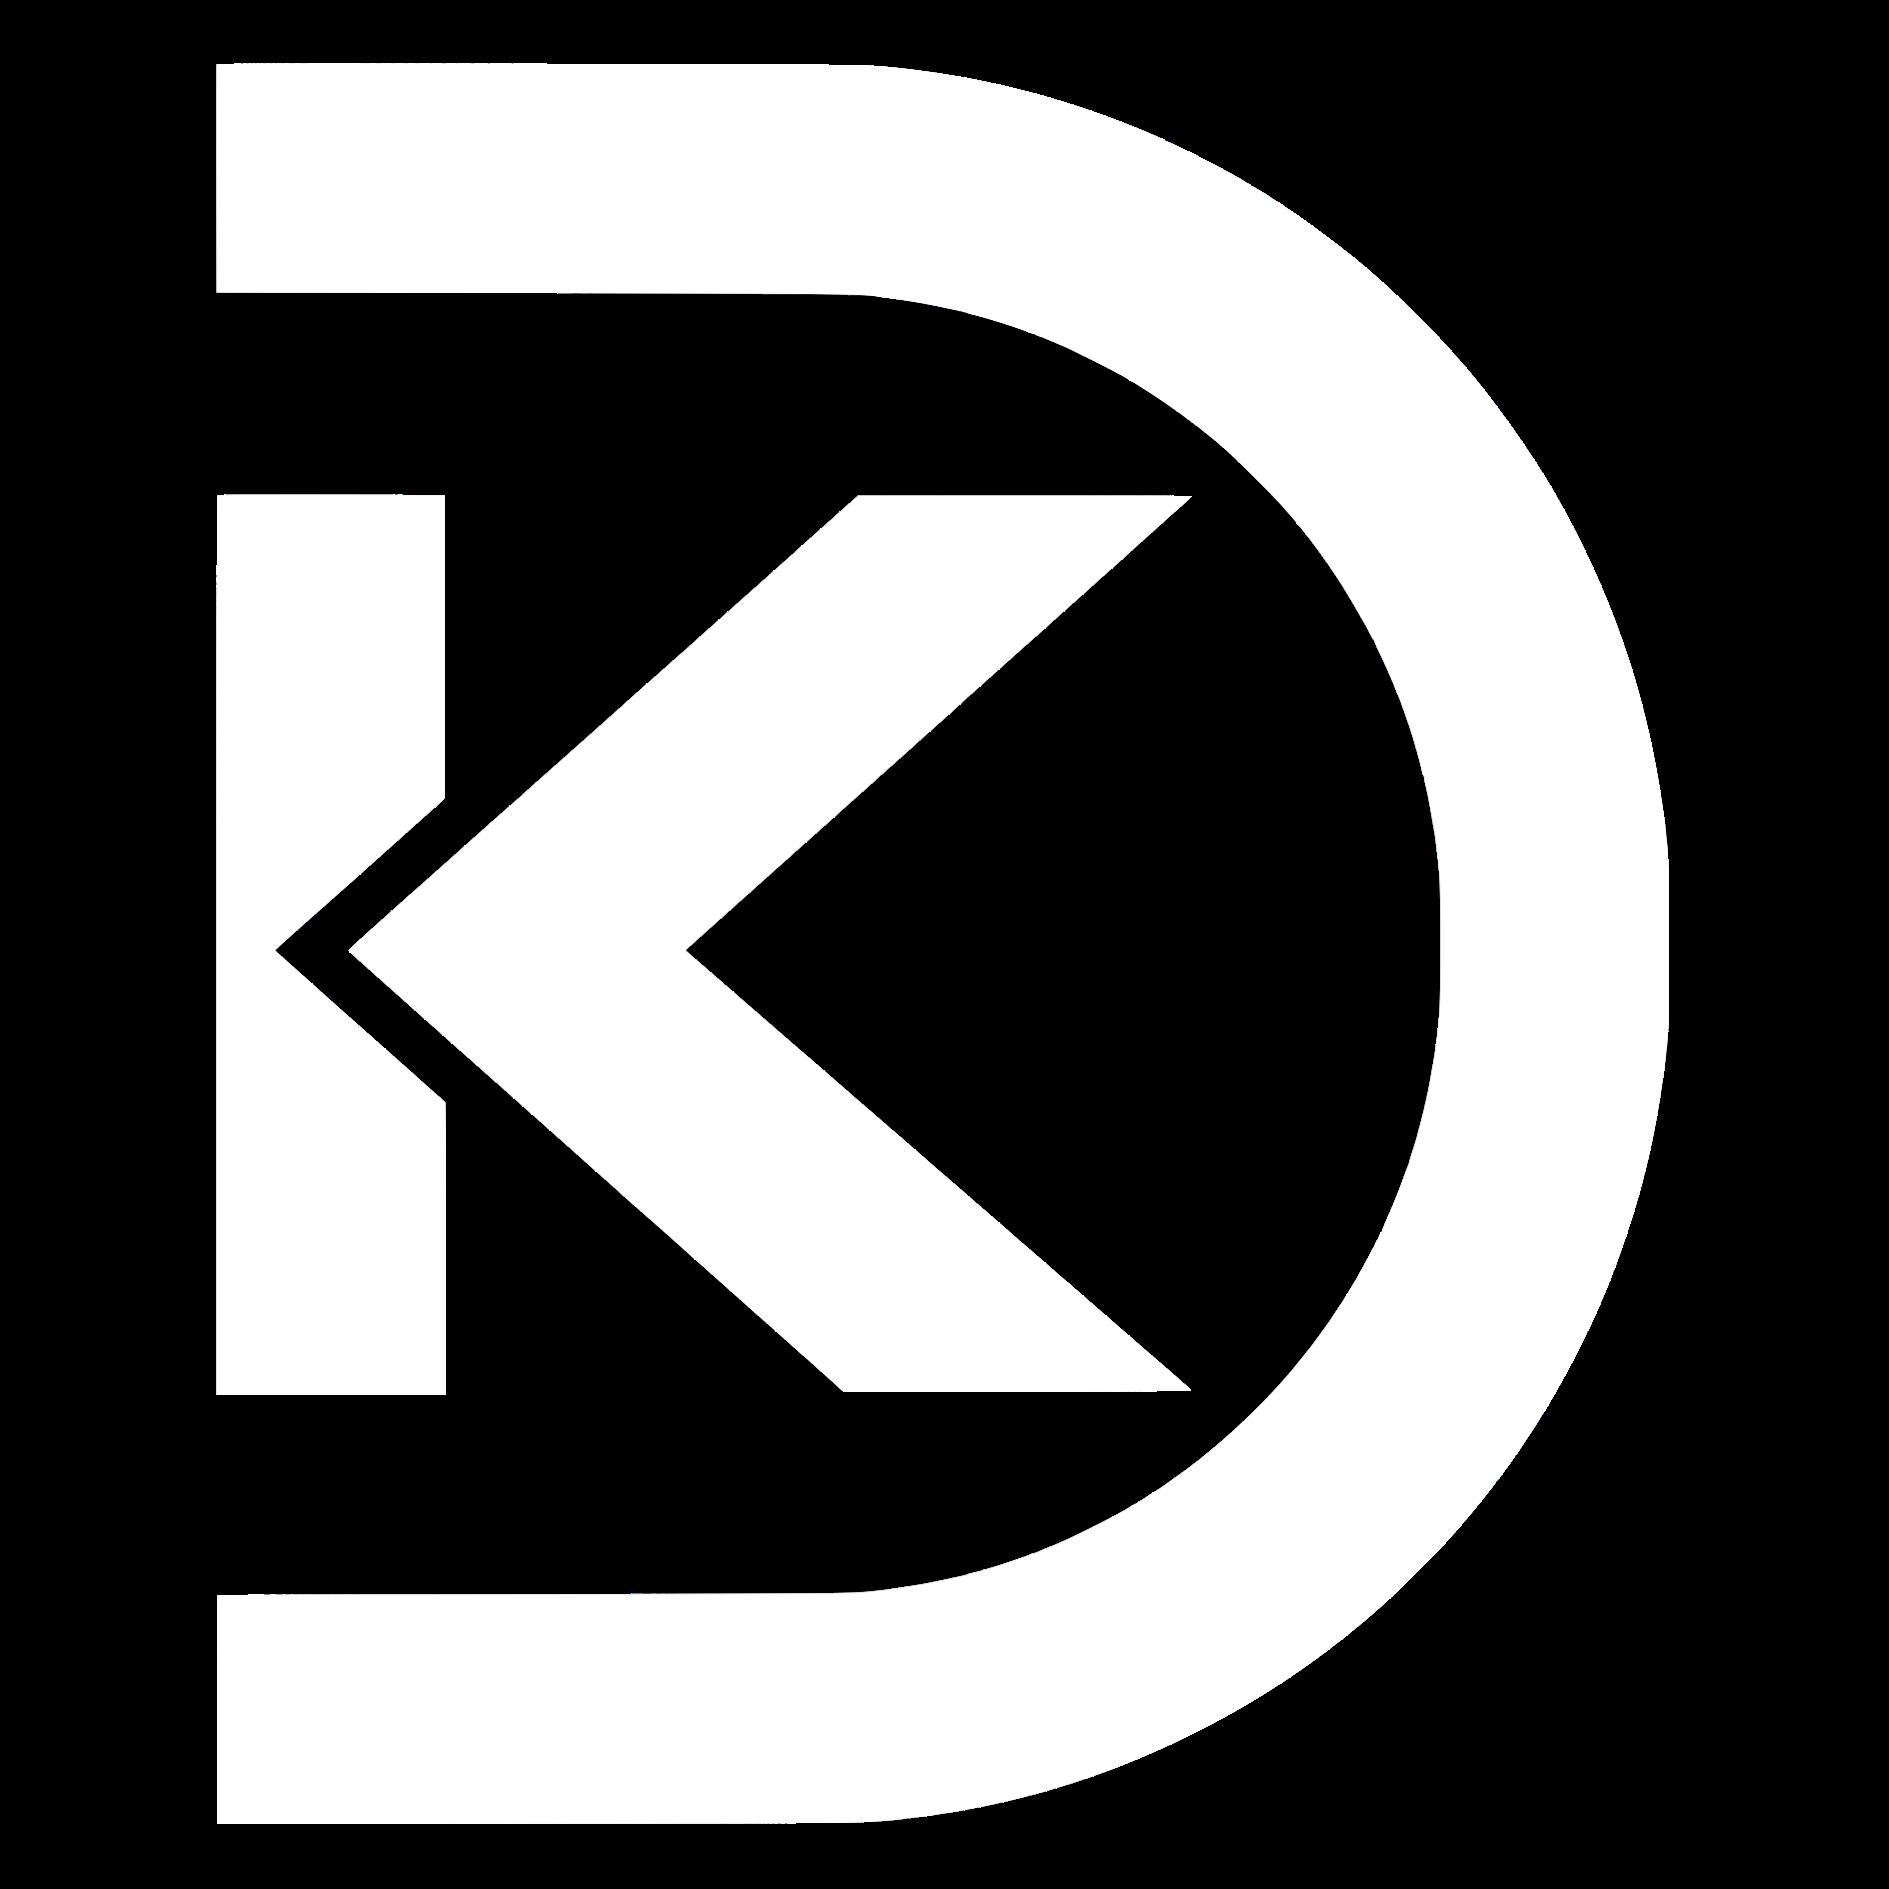 KERN-DEUDIAM Logo White